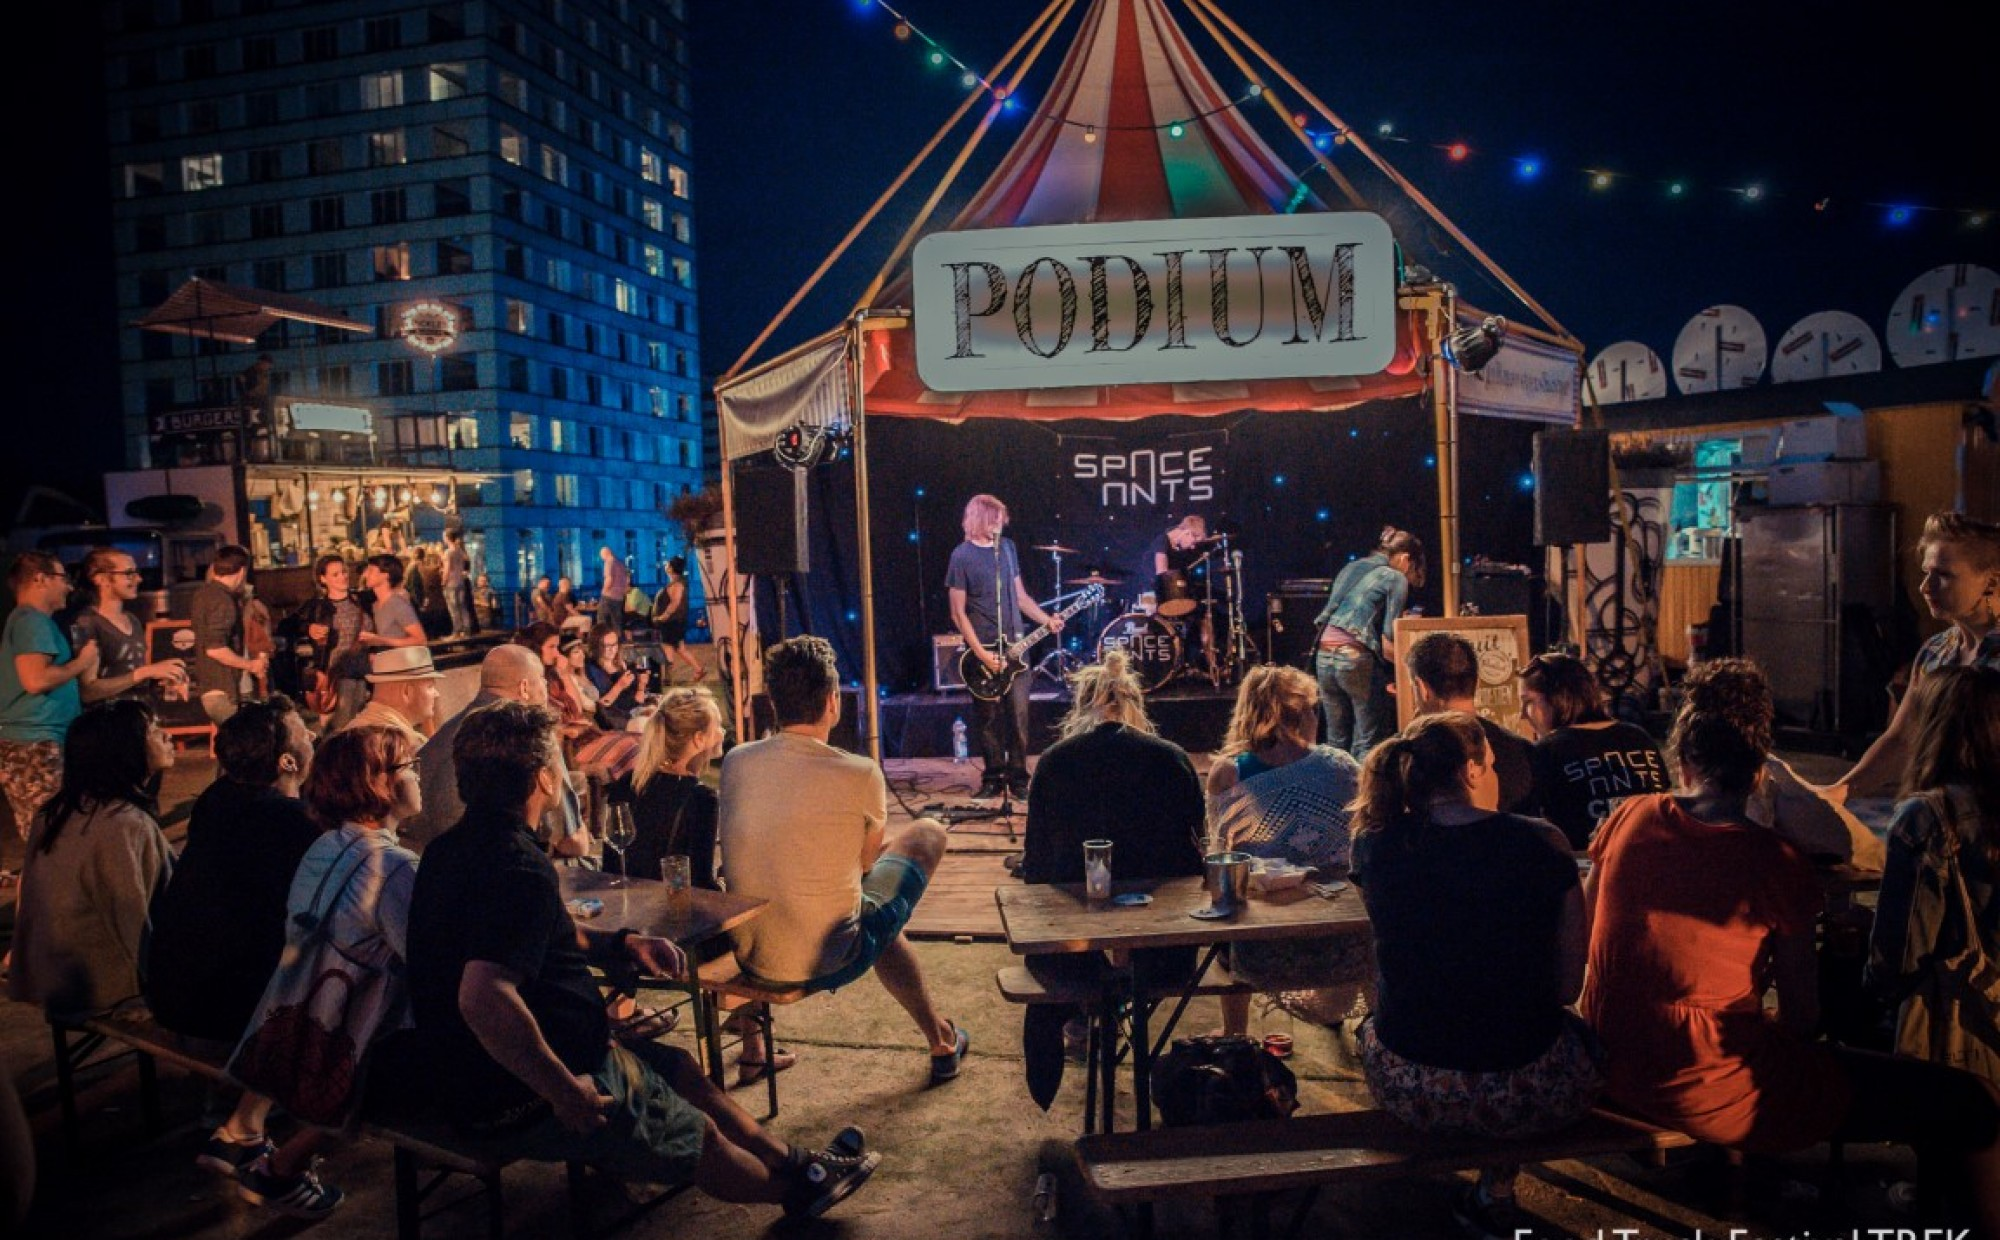 Festivaltrek_S-Hertogenbosch_2015_107-2000x1240